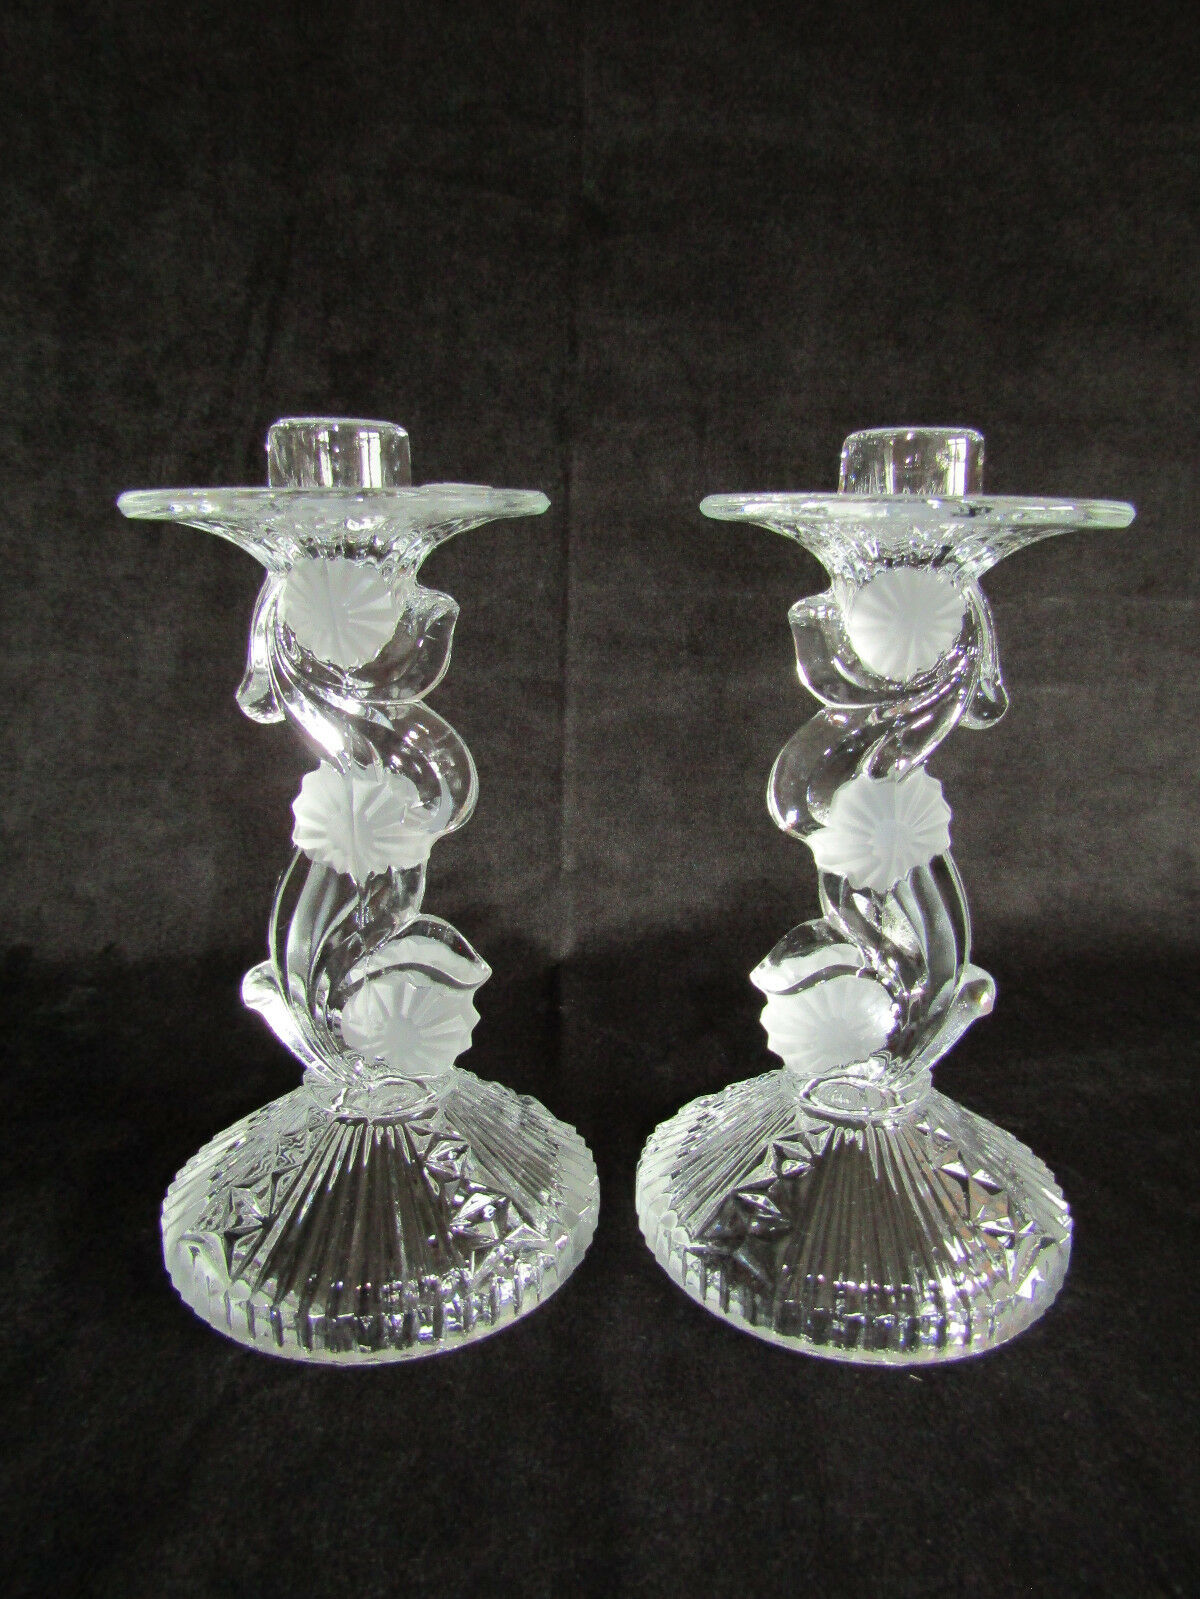 2er Set Prunkhafte Bohemia Kerzenständer Kerzenhalter KerzenleuchterKristallglas